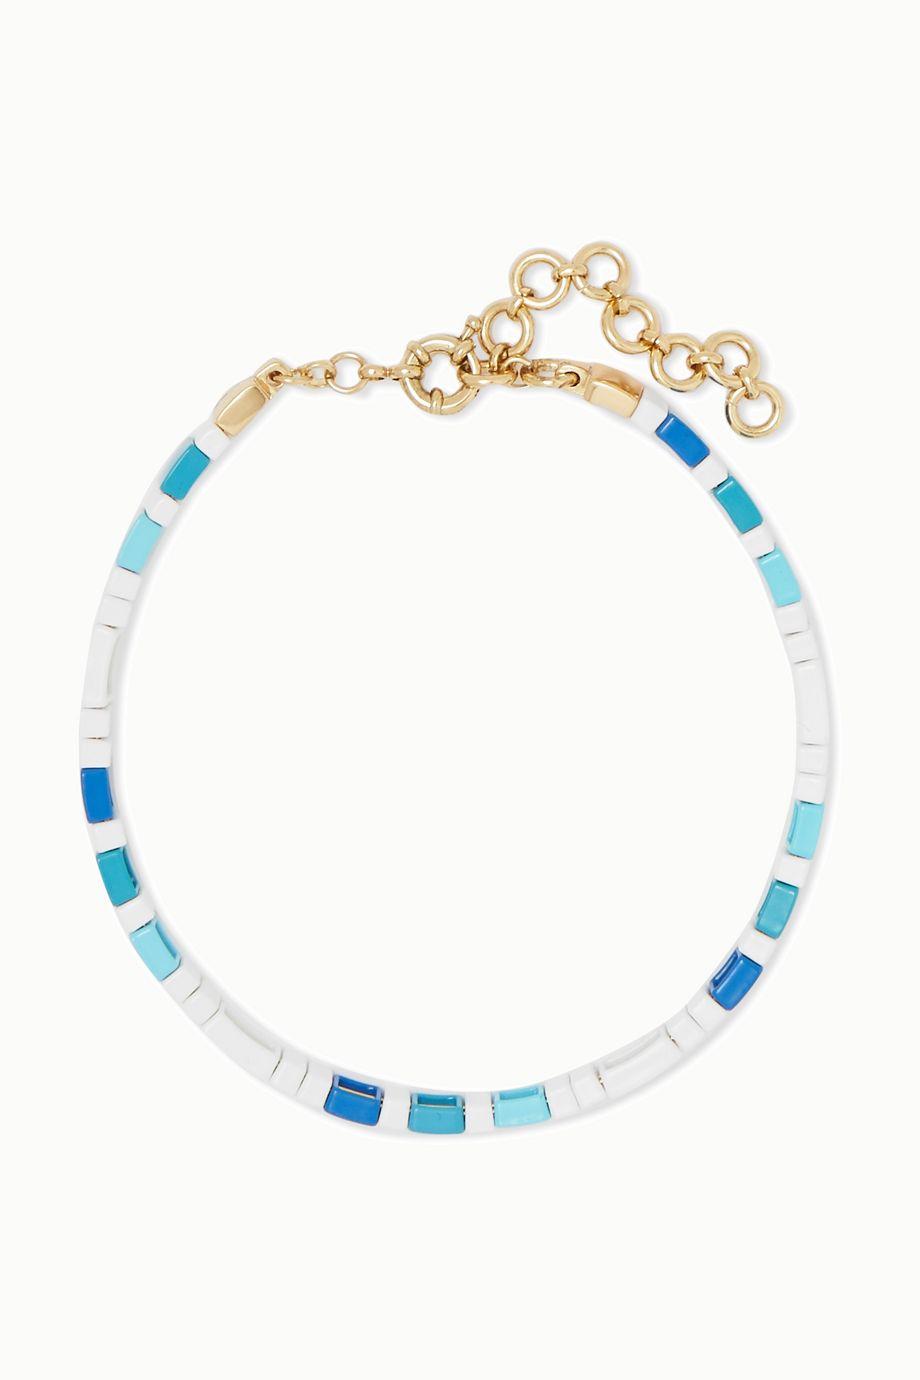 Roxanne Assoulin Mykonos 搪瓷项圈式项链